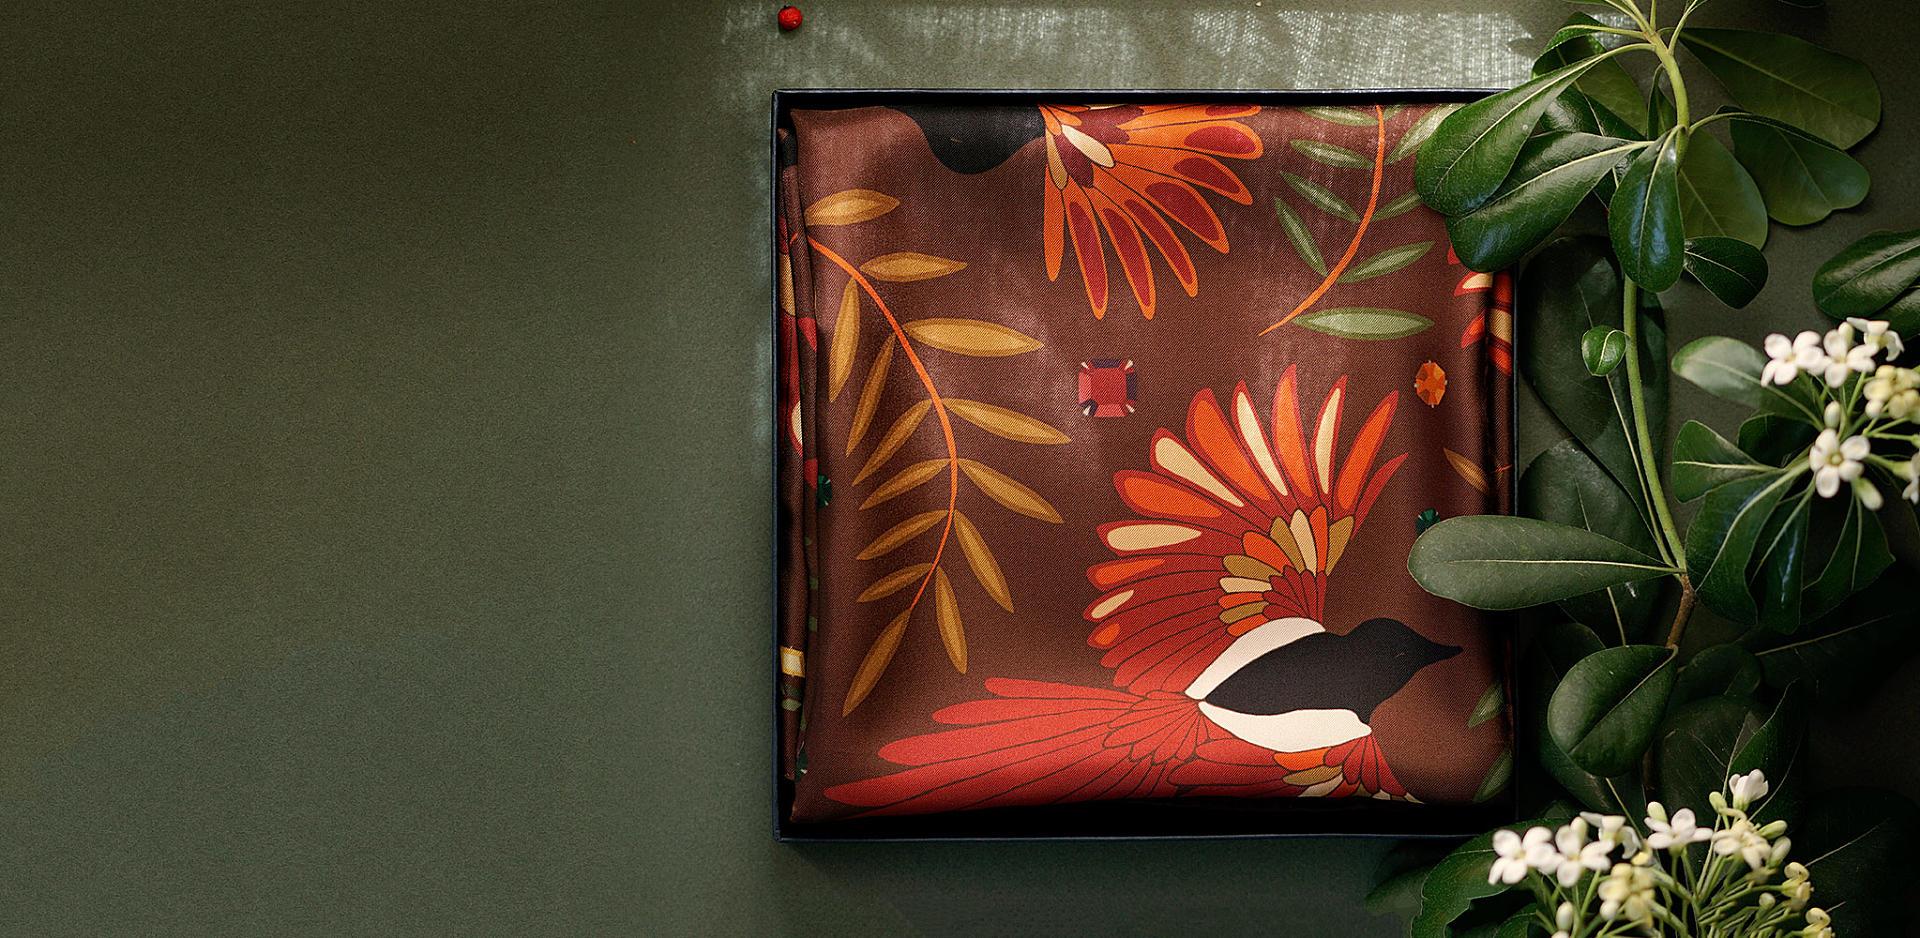 le-chale-bleu-silk-twill-scarf-magpies-chocolate-box-2048x1000